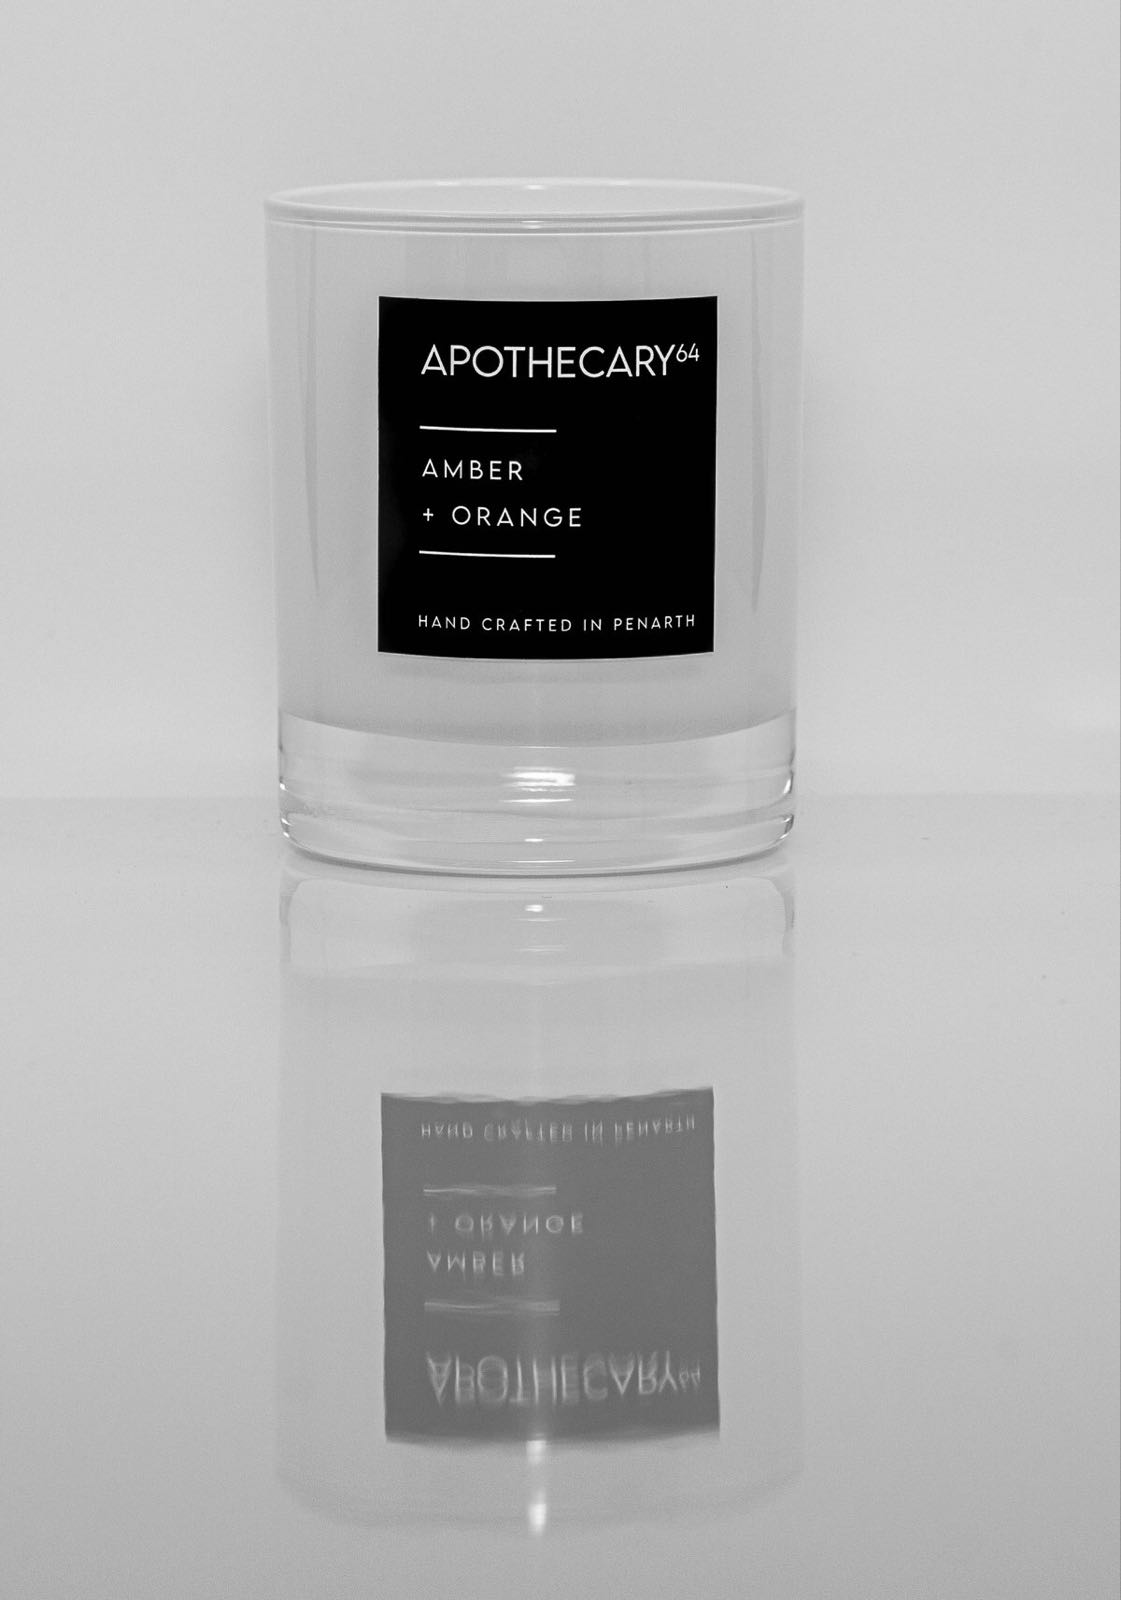 Apothecary 64 - Amber & Orange